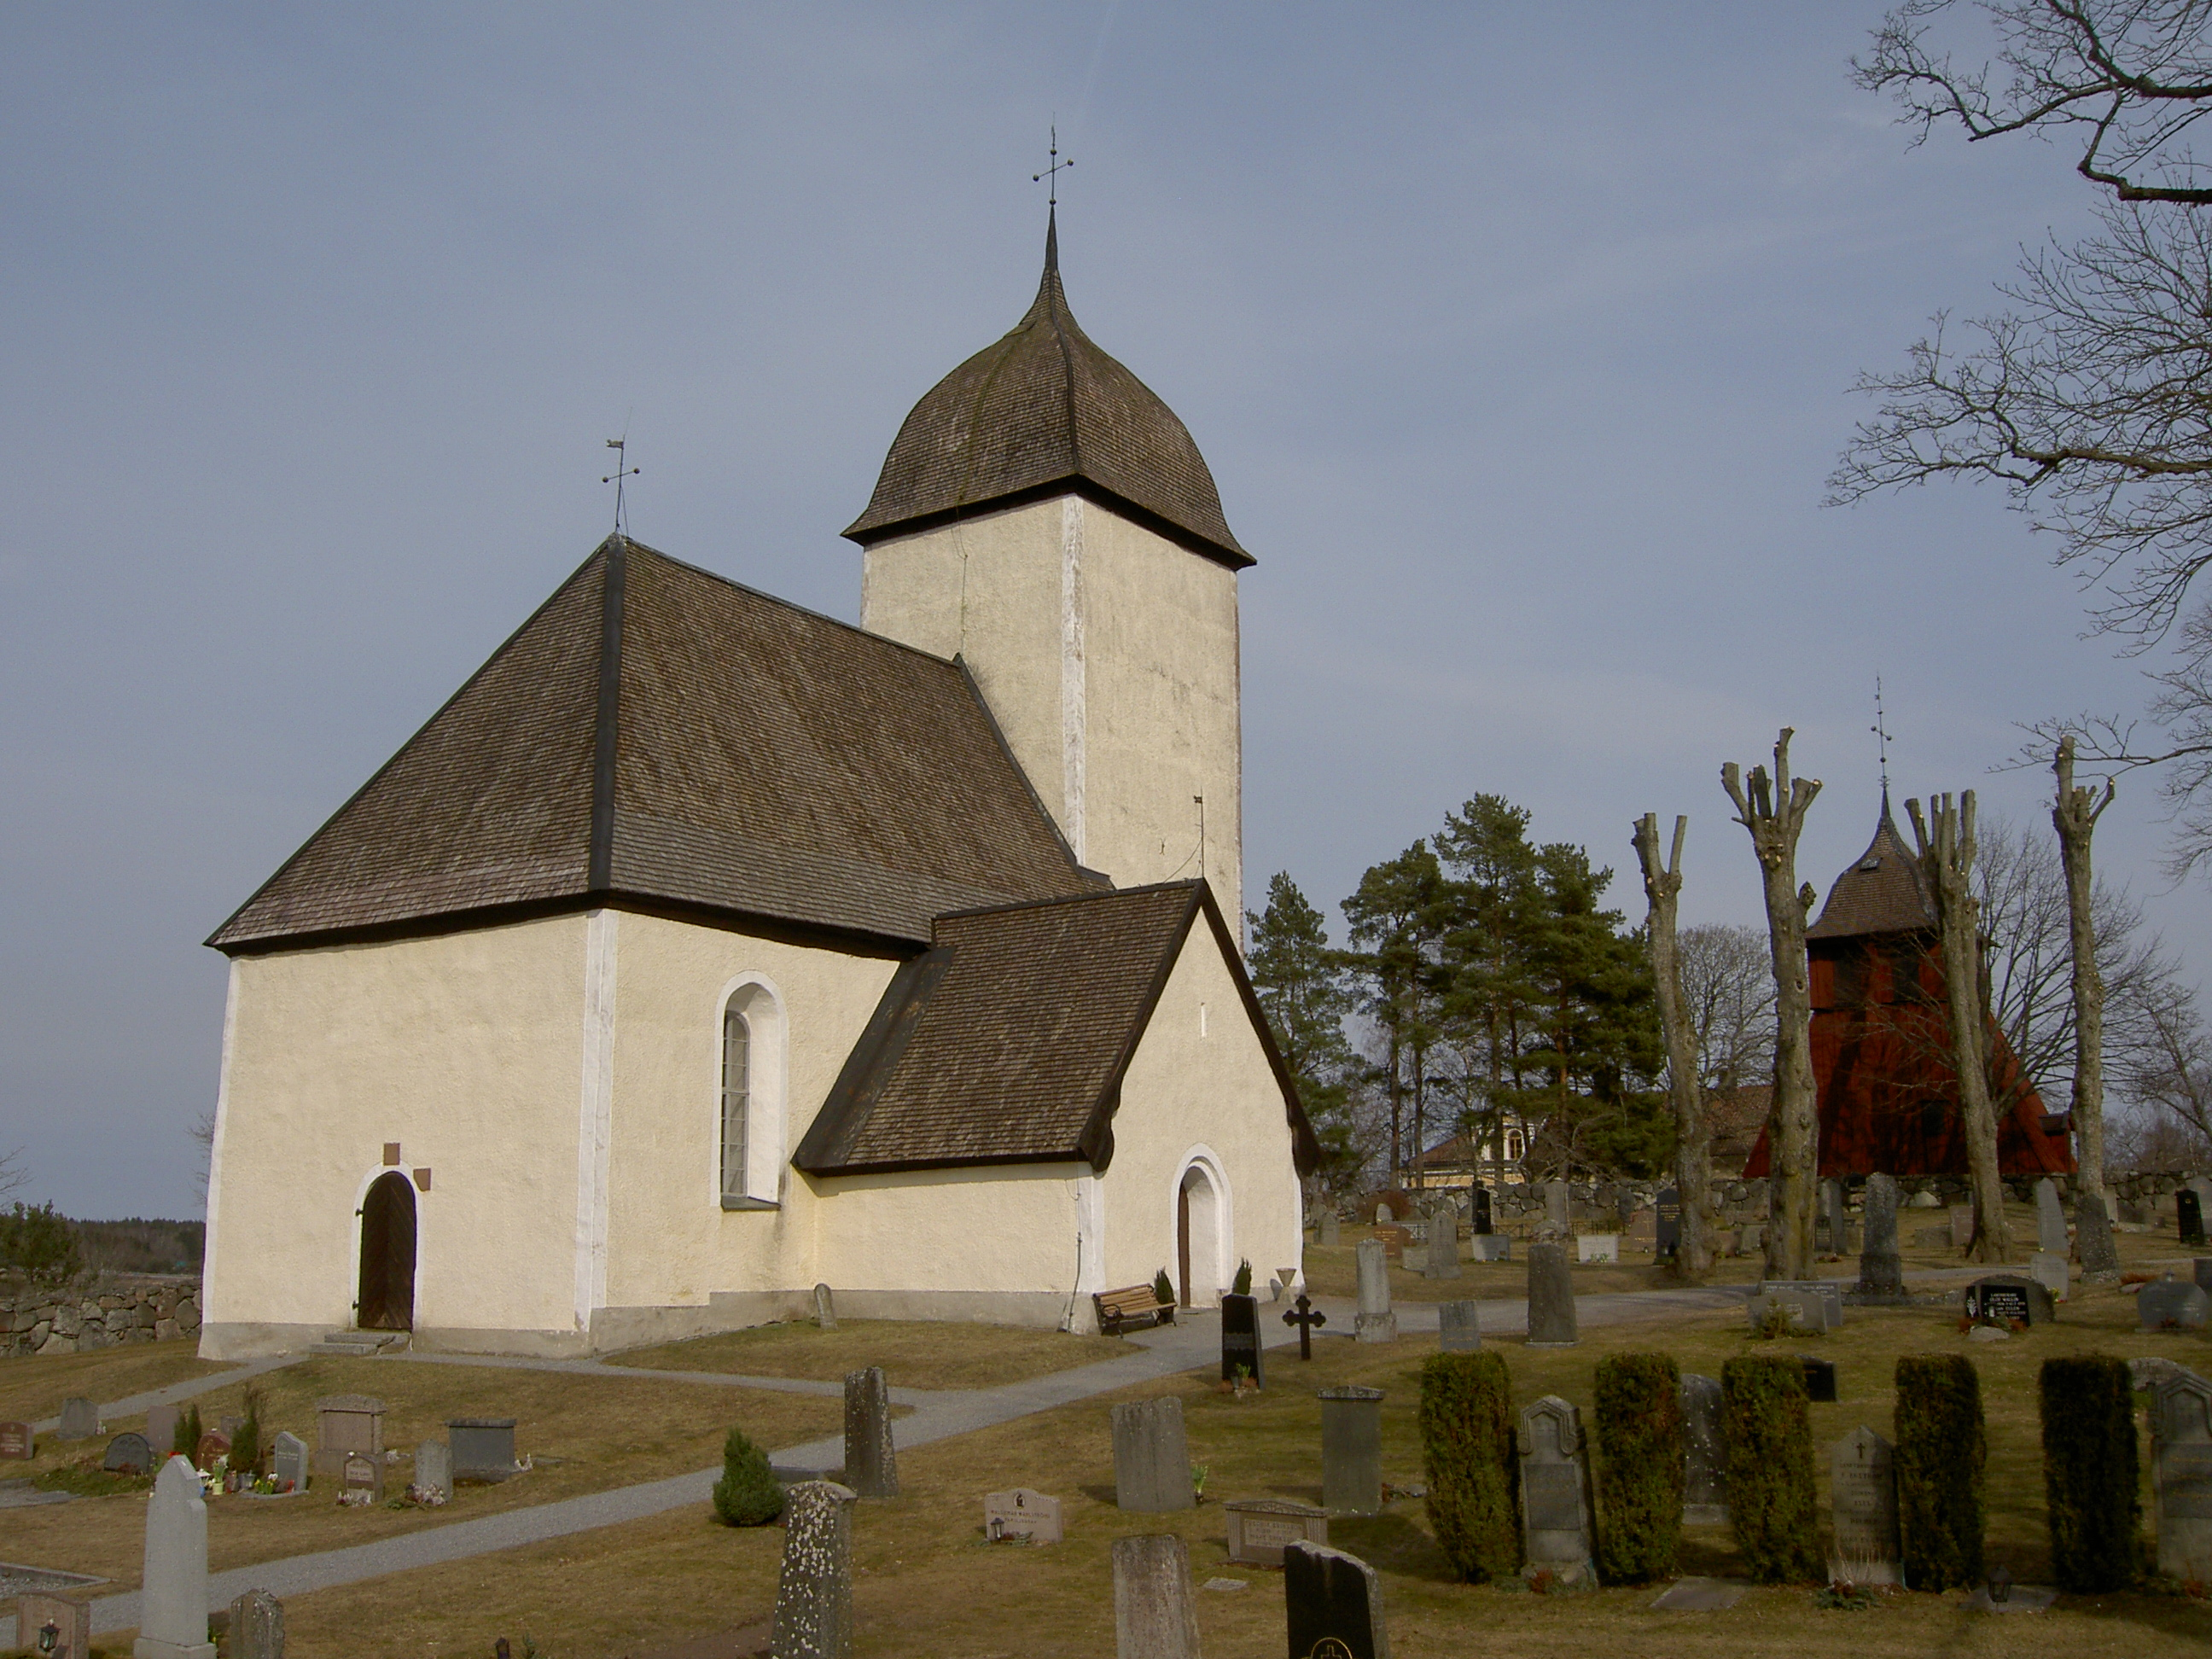 Arlanda, Mby gor, stone - RuneS